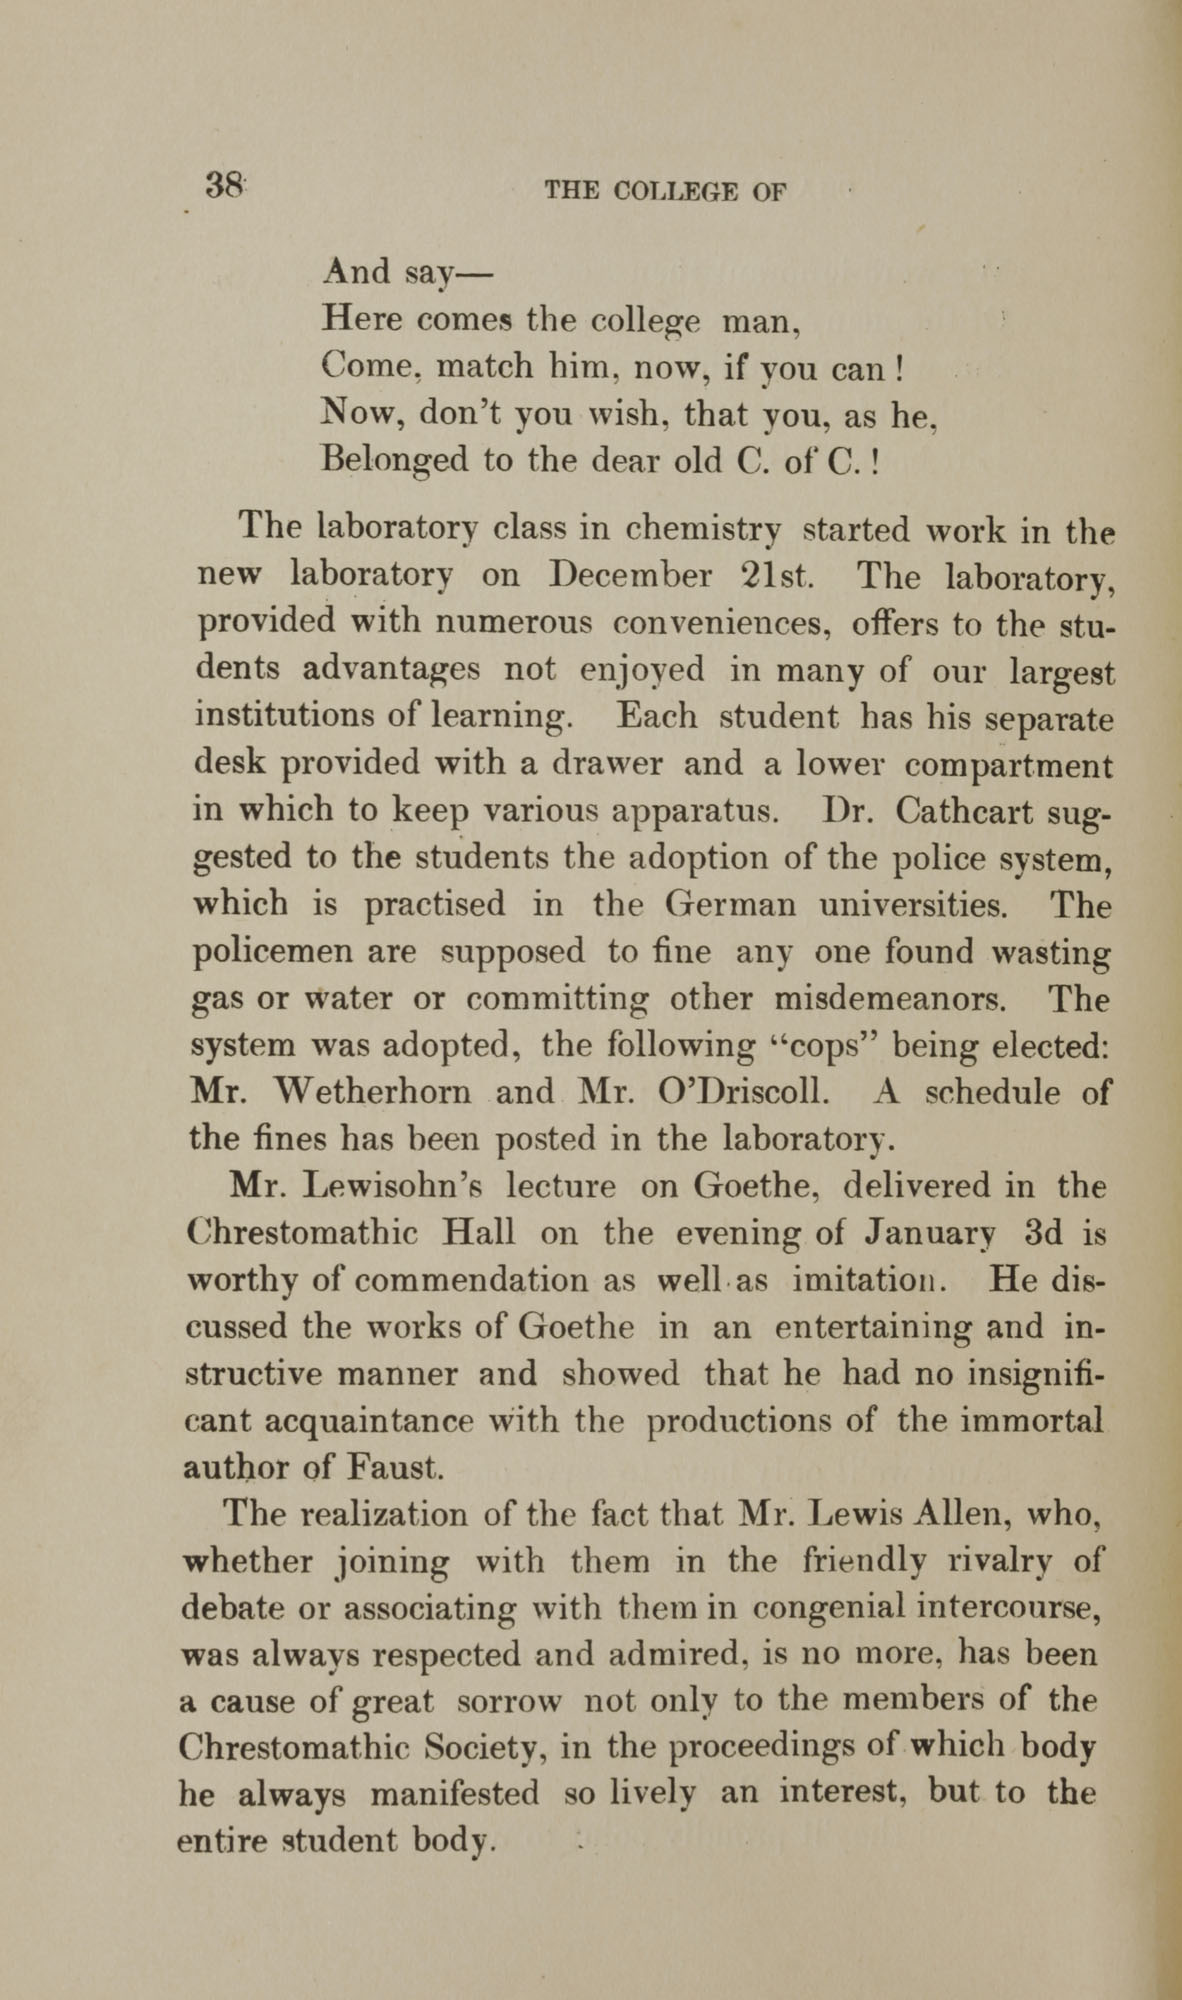 College of Charleston Magazine, 1898, Vol I. No. 1, page 38